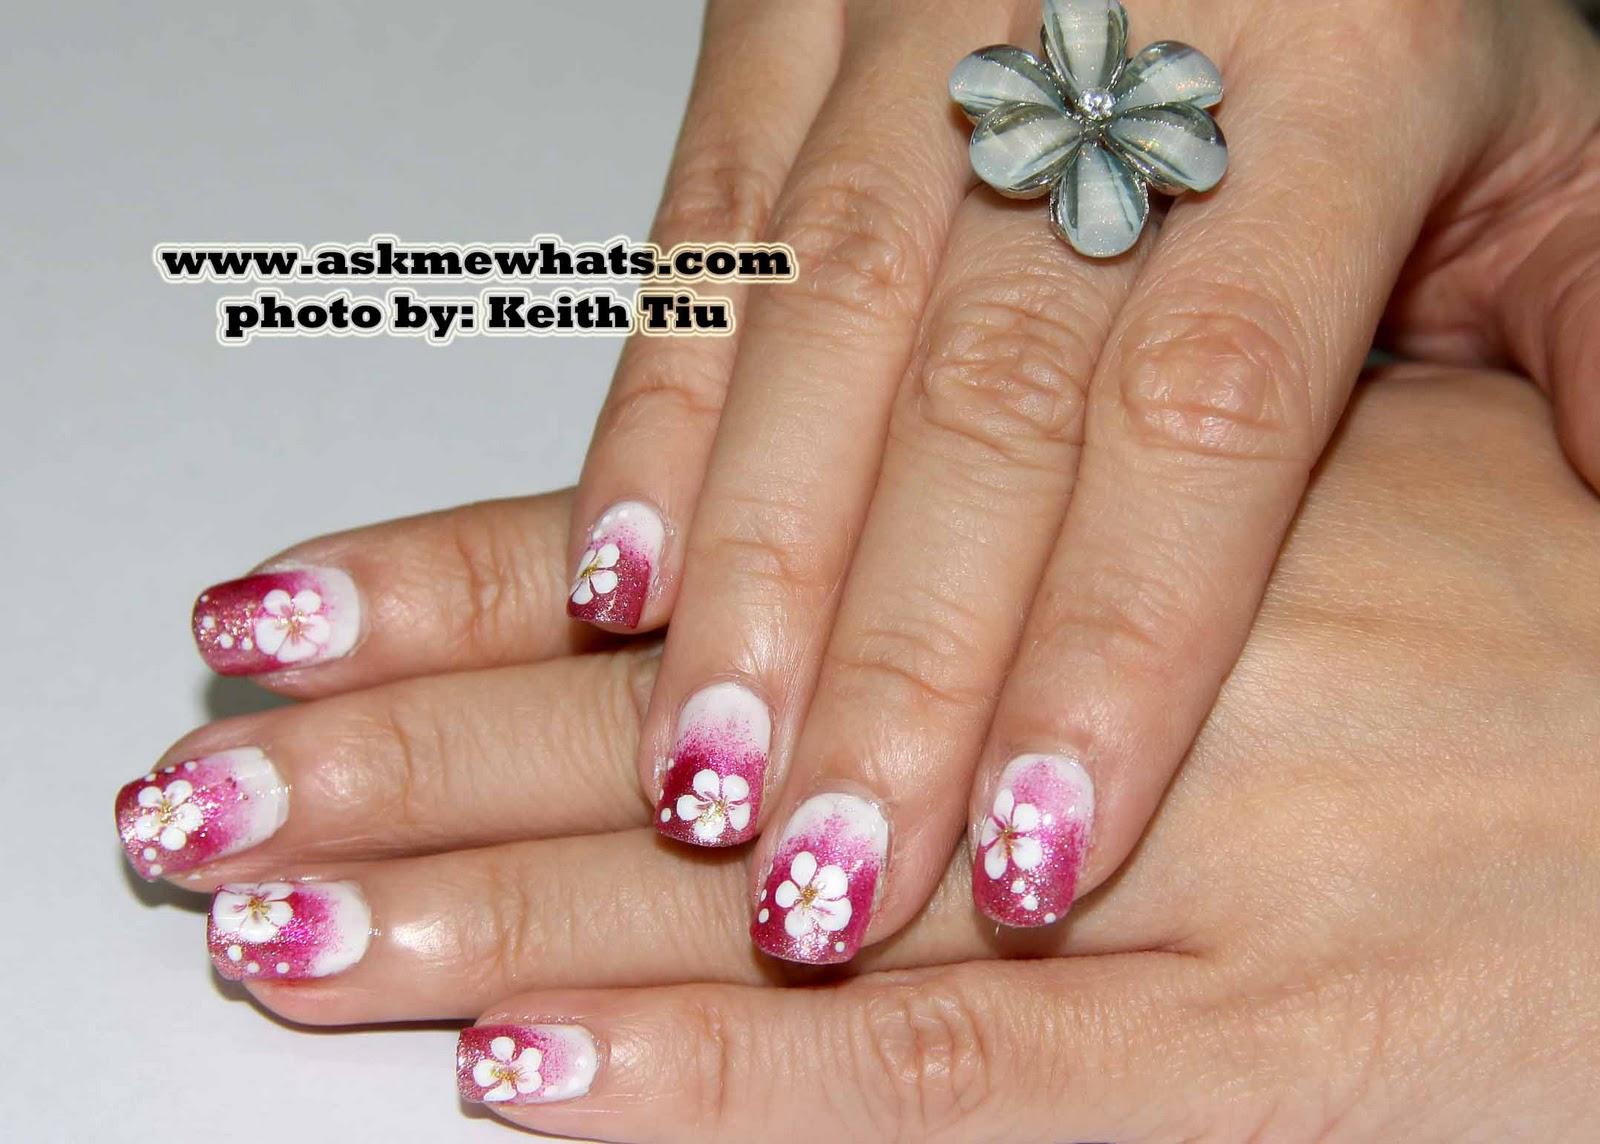 Hawaiian flower nail art designs image collections nail art and nail designs for hawaii images nail art and nail design ideas hawaiian flower nail art choice prinsesfo Gallery